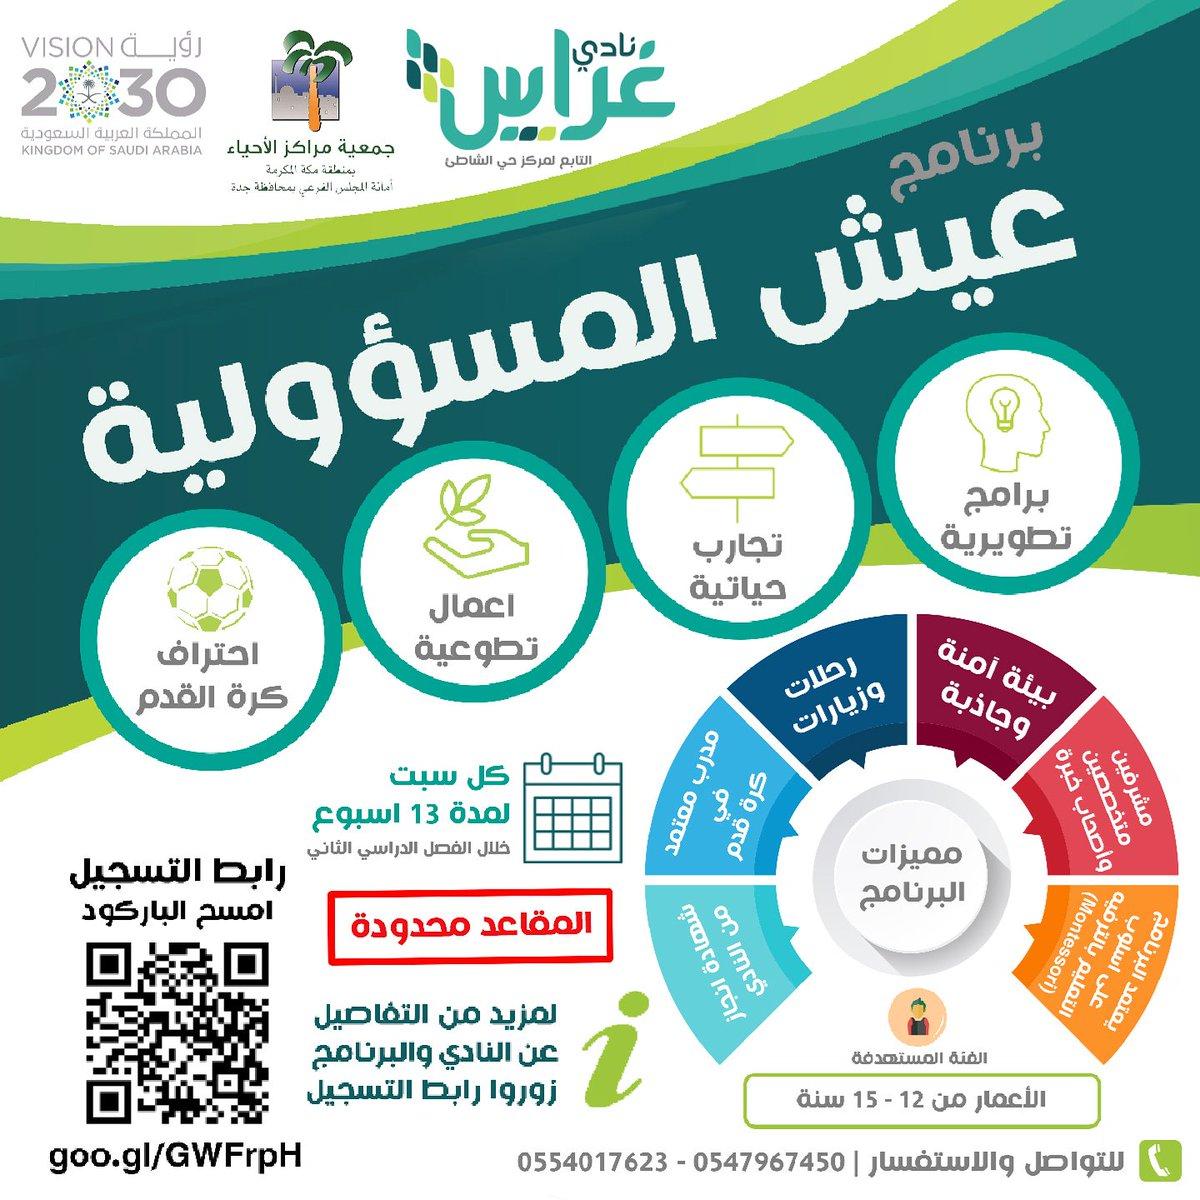 8edff3136 مركز حي الشاطئ بجدة (@haialshati3)   Twitter